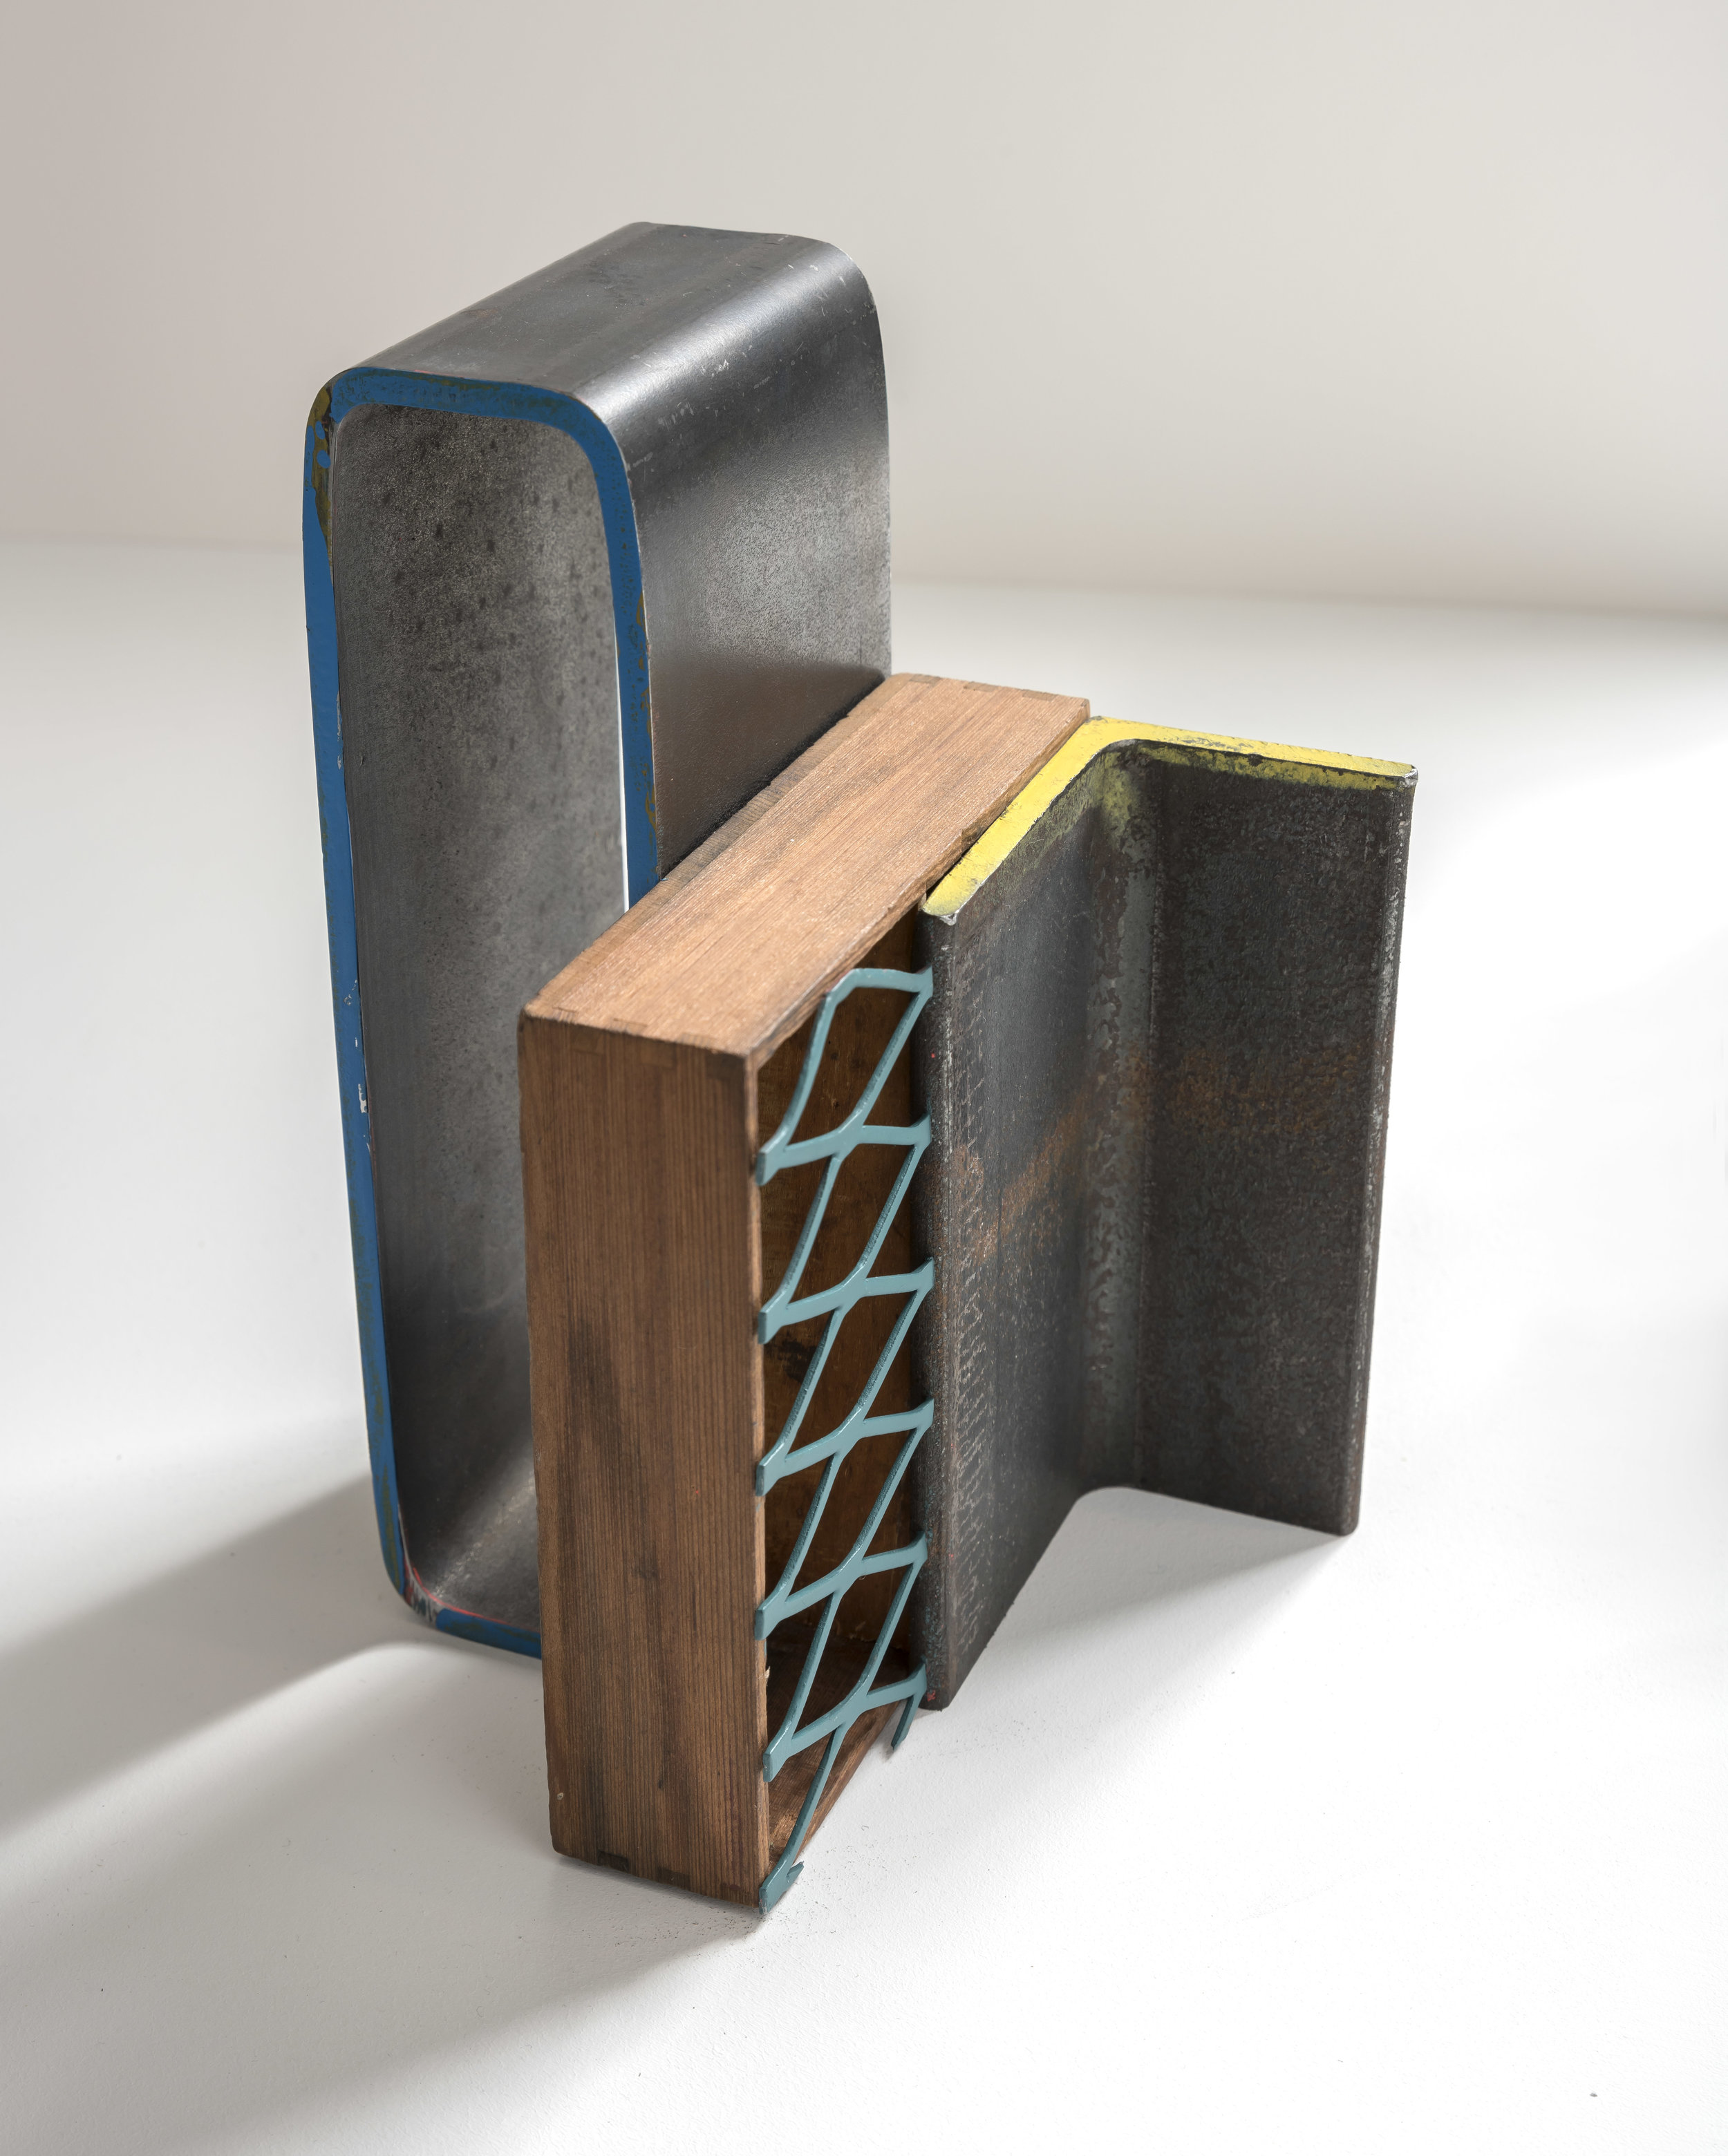 Assemblage ll , 2019  steel, wood, magnet, aerosol paint 5 1/2 x 8 x 5 3/8 inches; 14 x 20.3 x 13.7 centimeters  $3,000.00